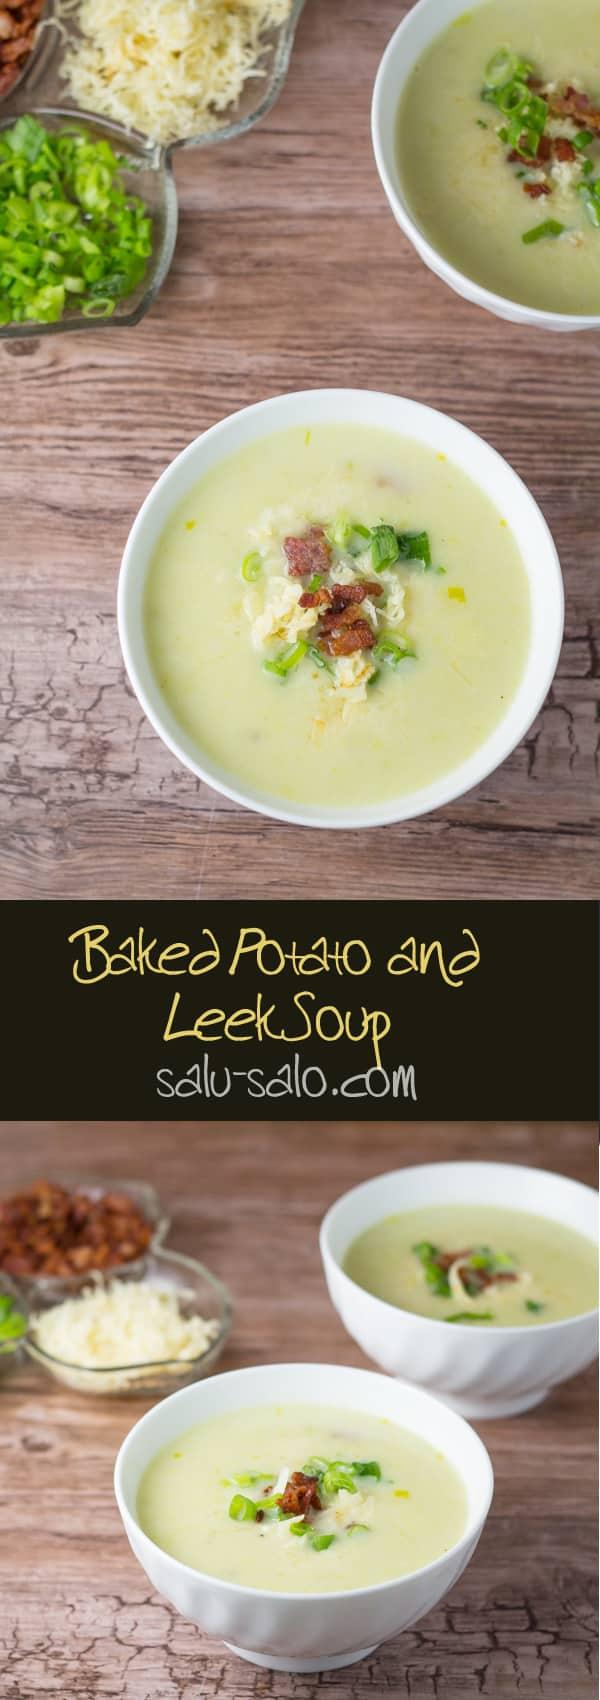 Baked Potato and Leek Soup